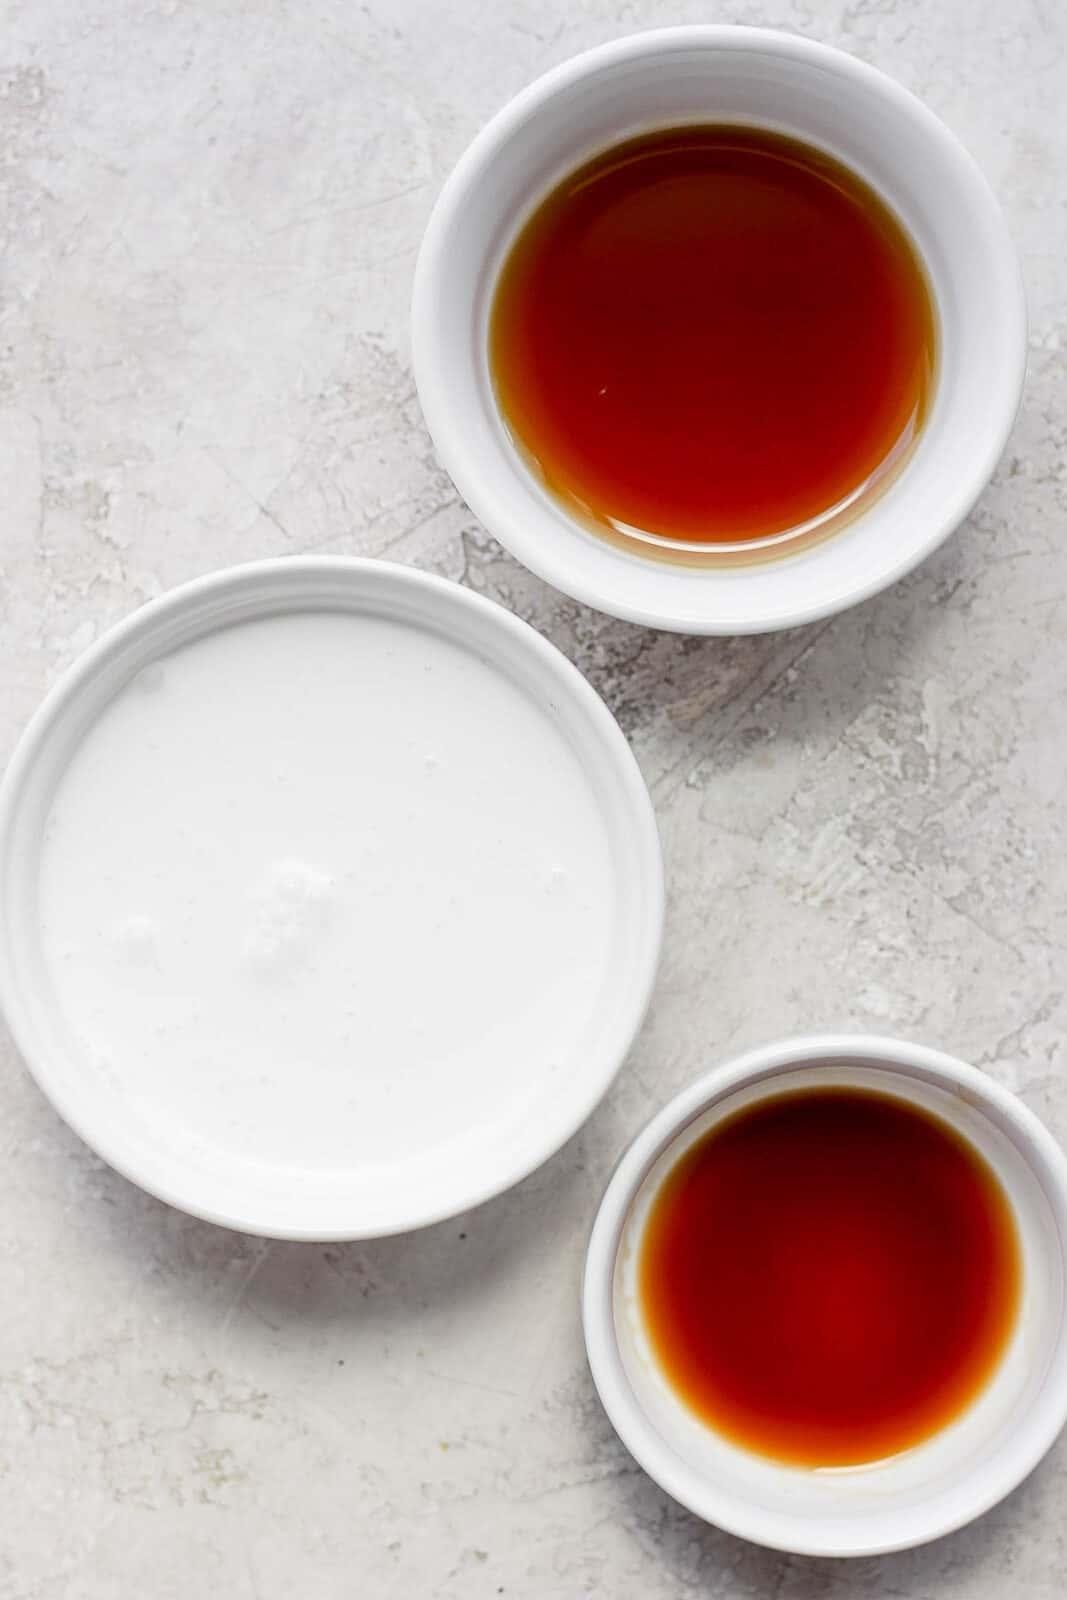 Vanilla sweet cream ingredients in bowls.